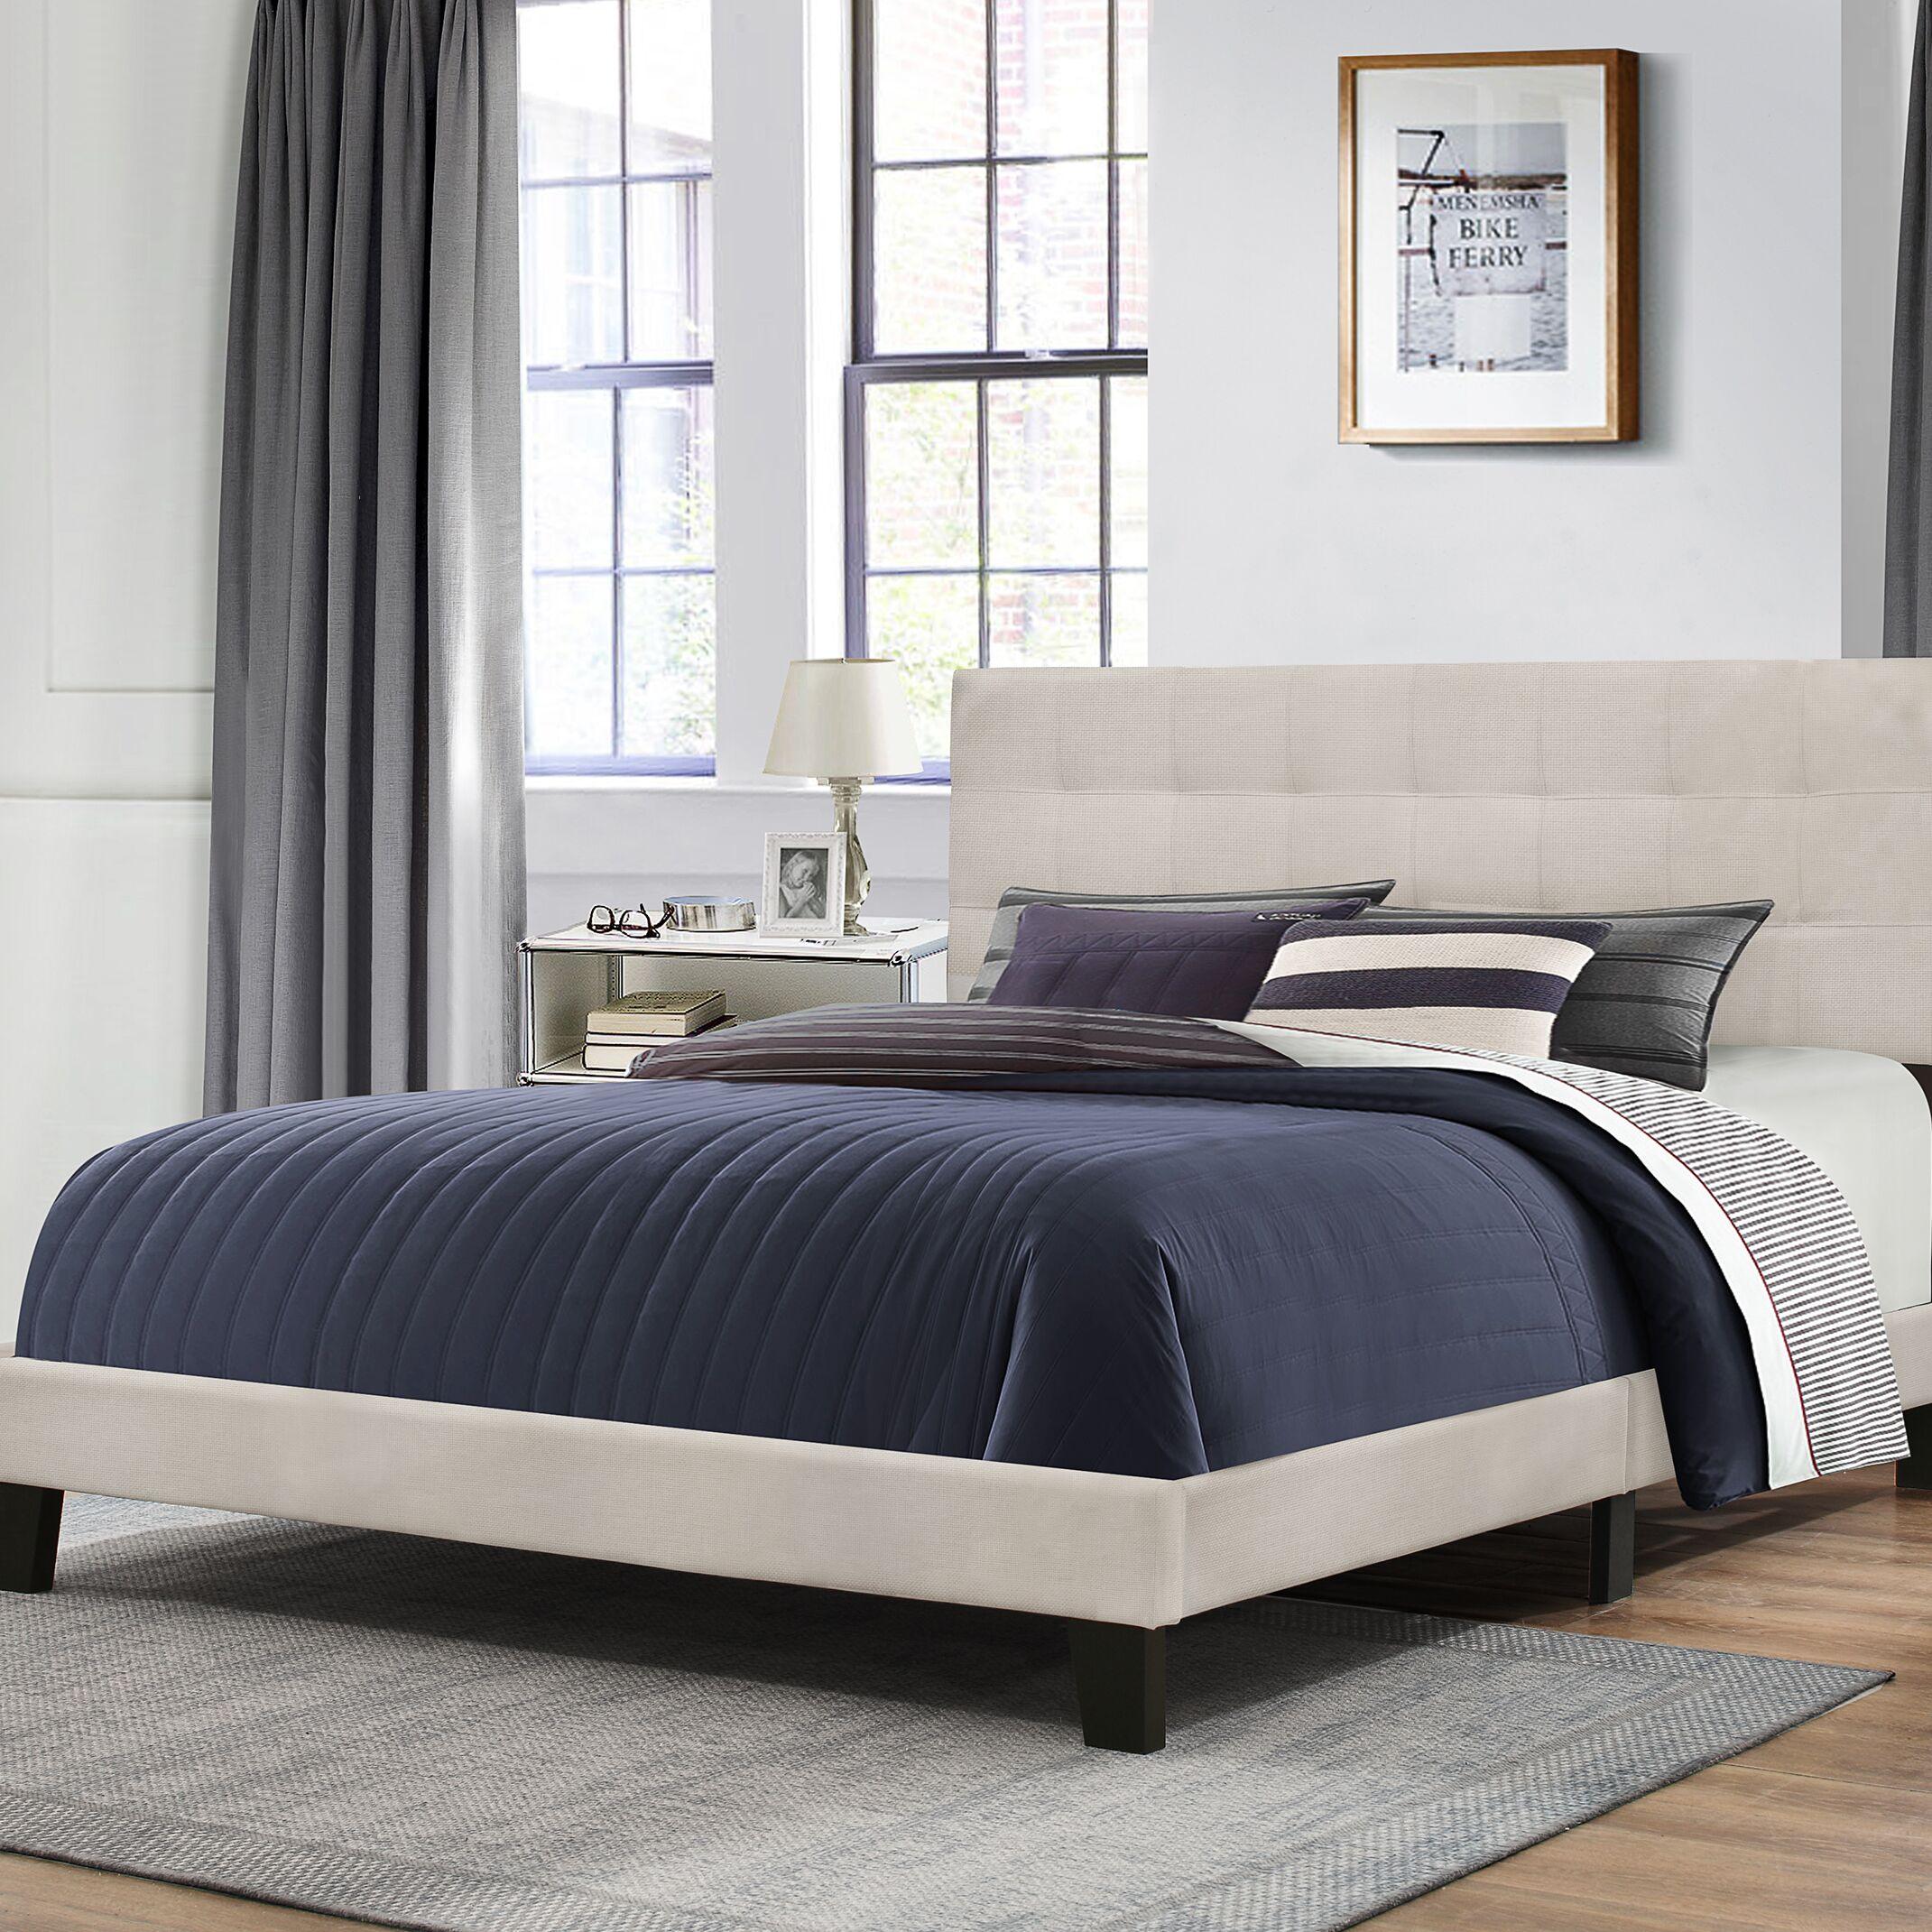 Decker Upholstered Panel Bed Size: Queen, Color: Fog